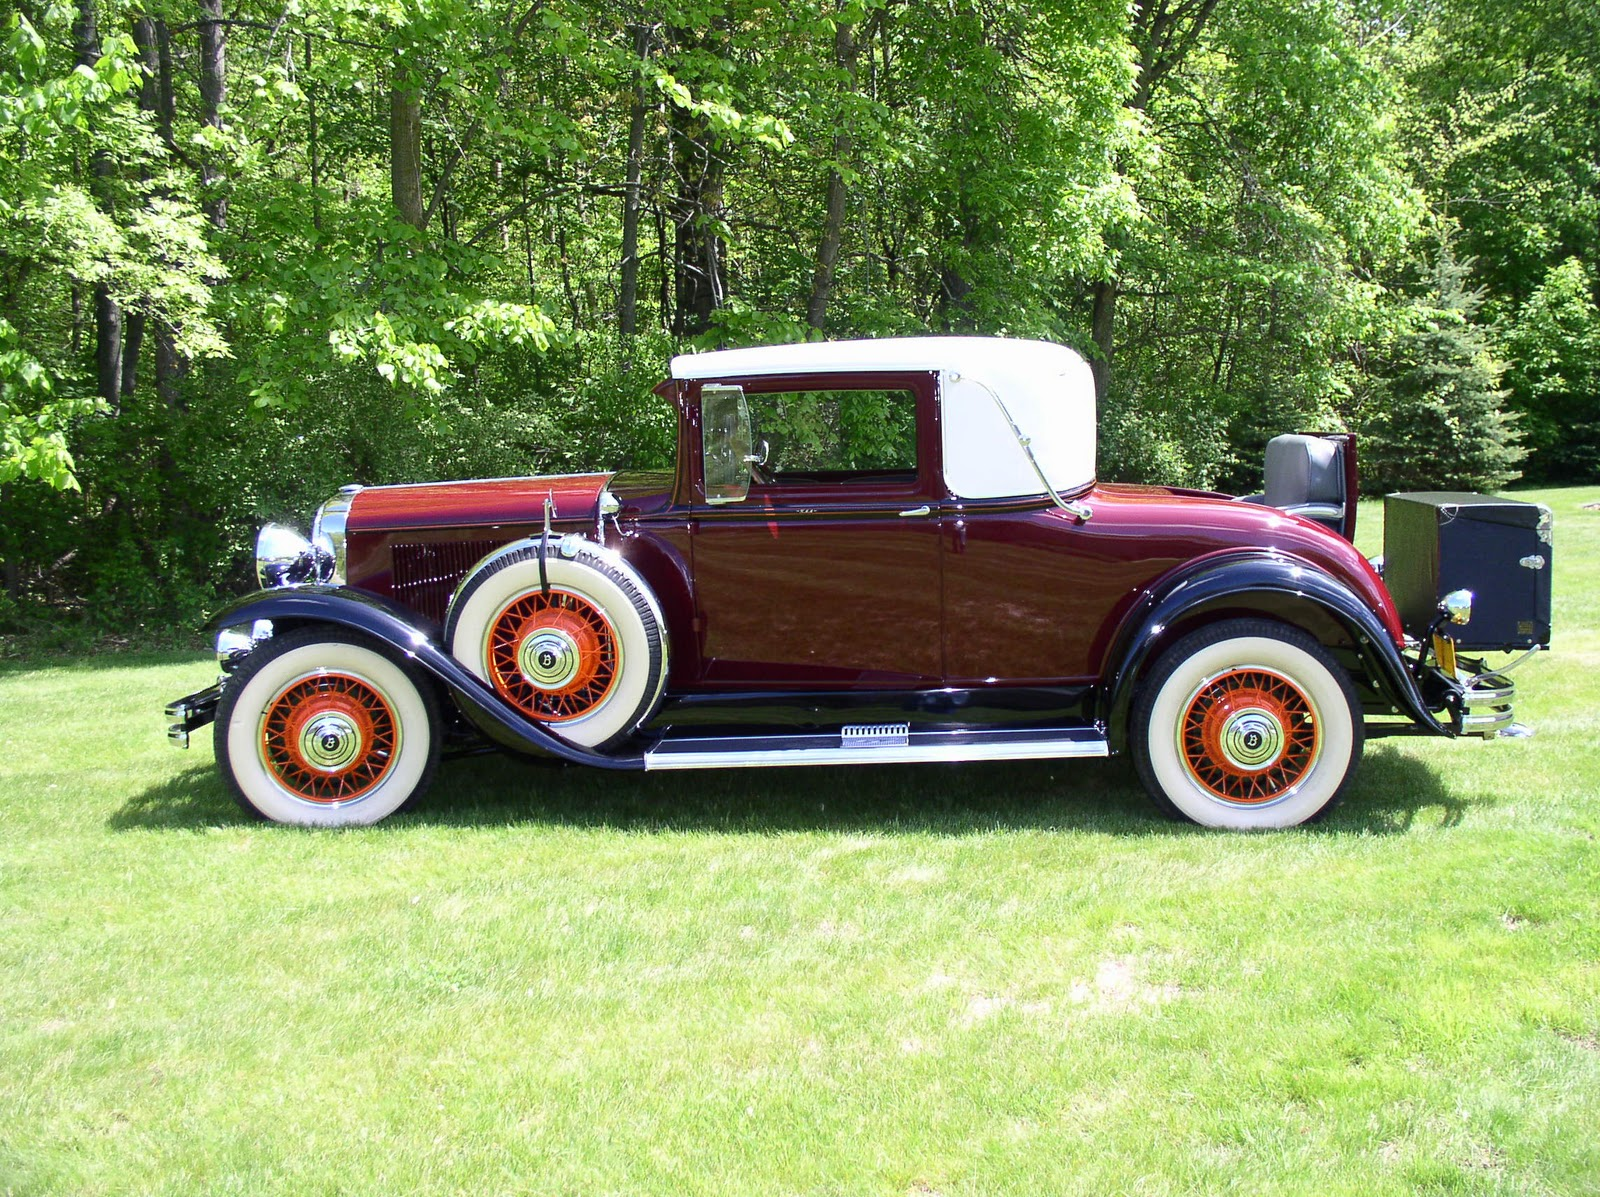 transpress nz 1930 buick series 60 sport coupe. Black Bedroom Furniture Sets. Home Design Ideas